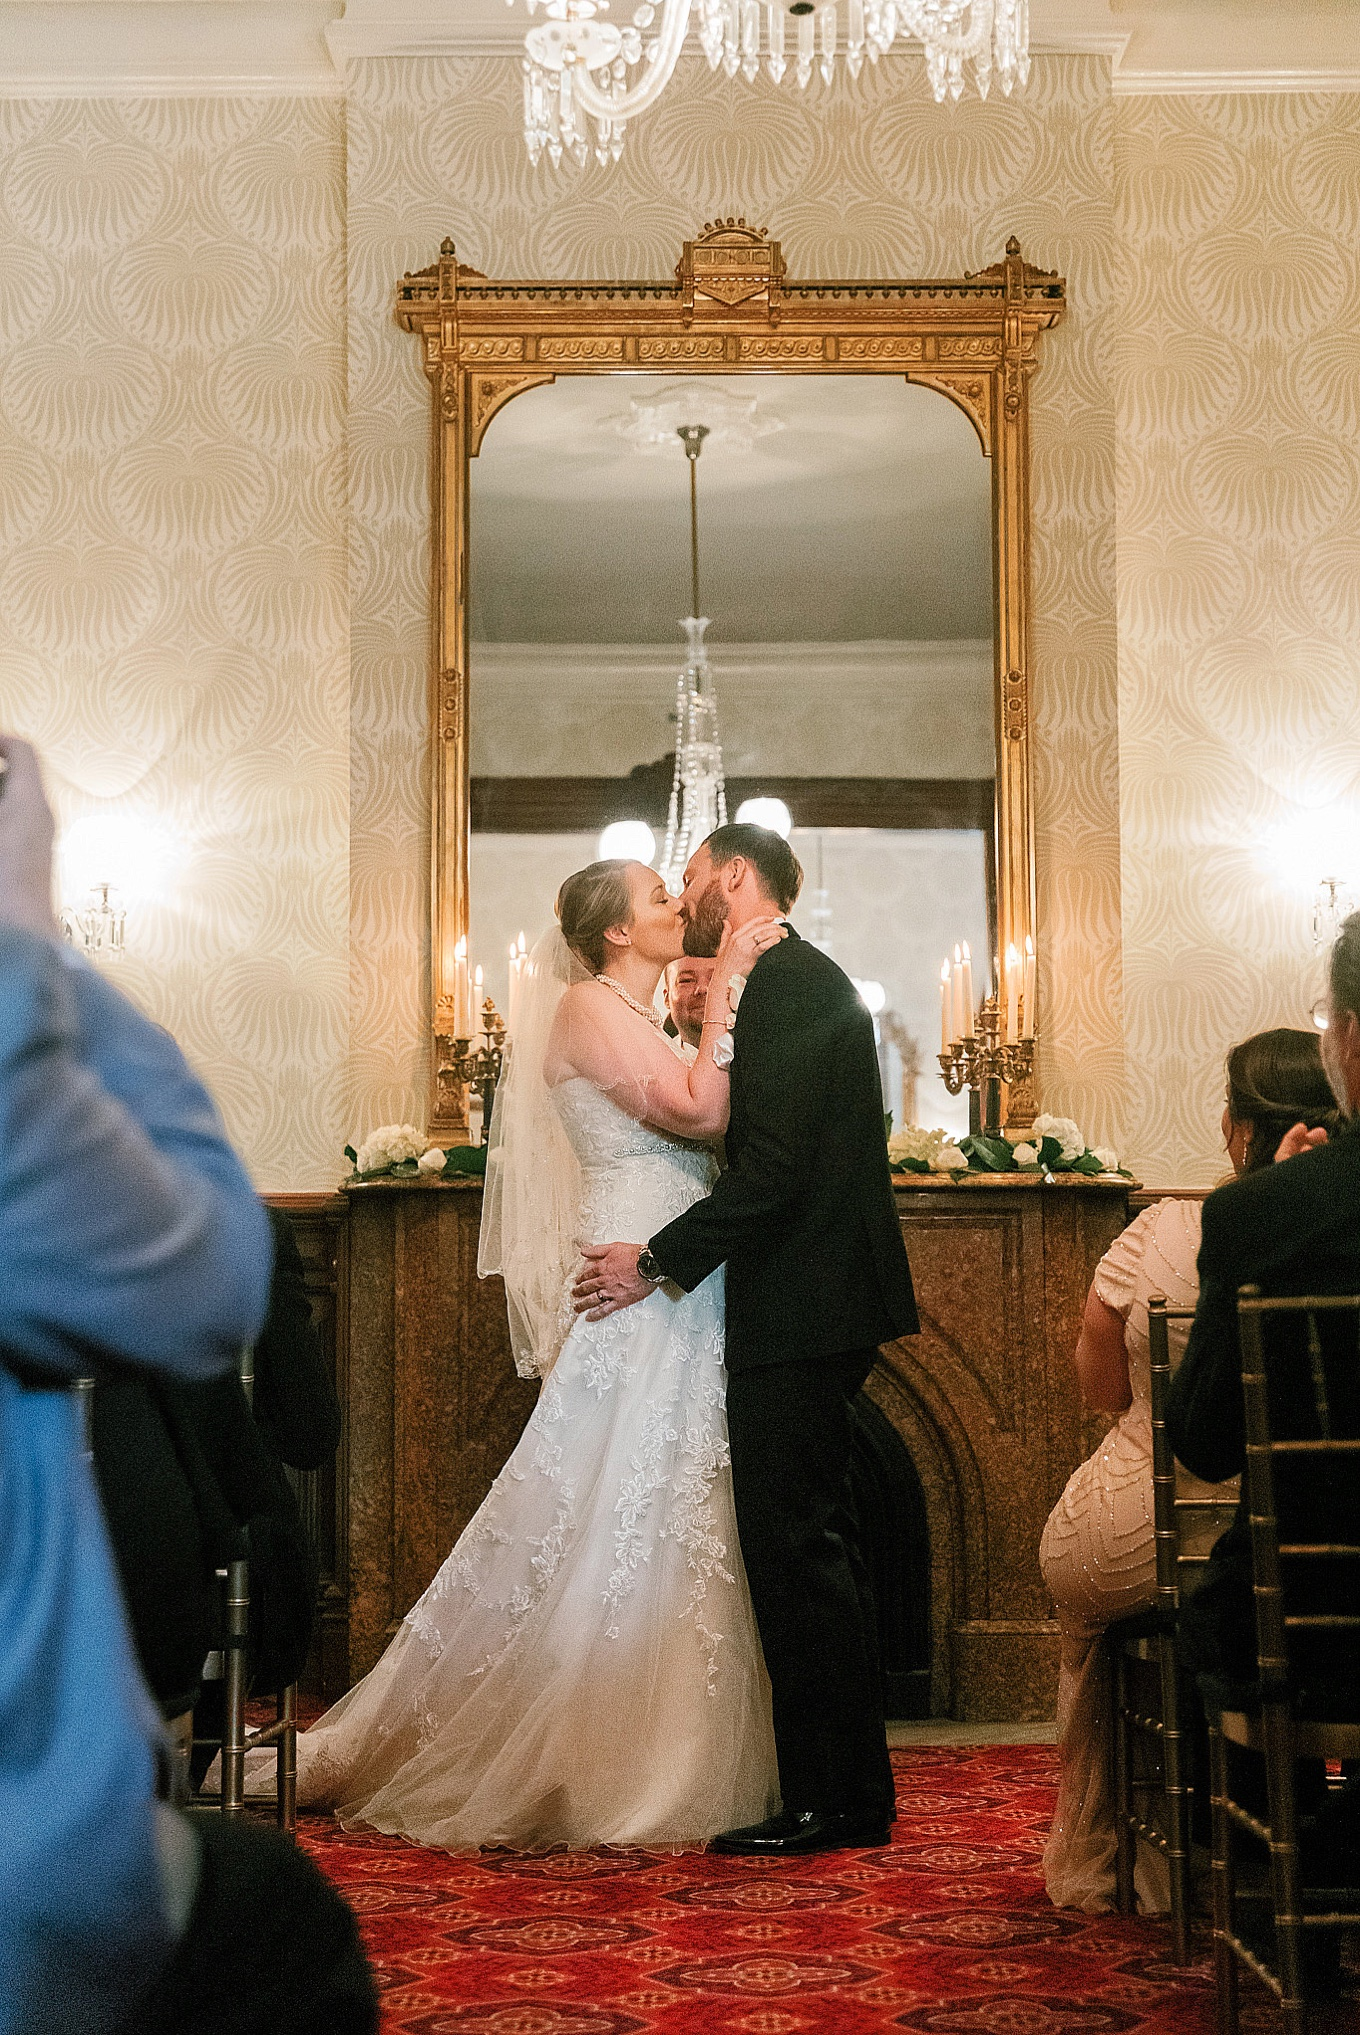 21_richmond-wedding-bolling-haxall-house-june2019-33.jpg